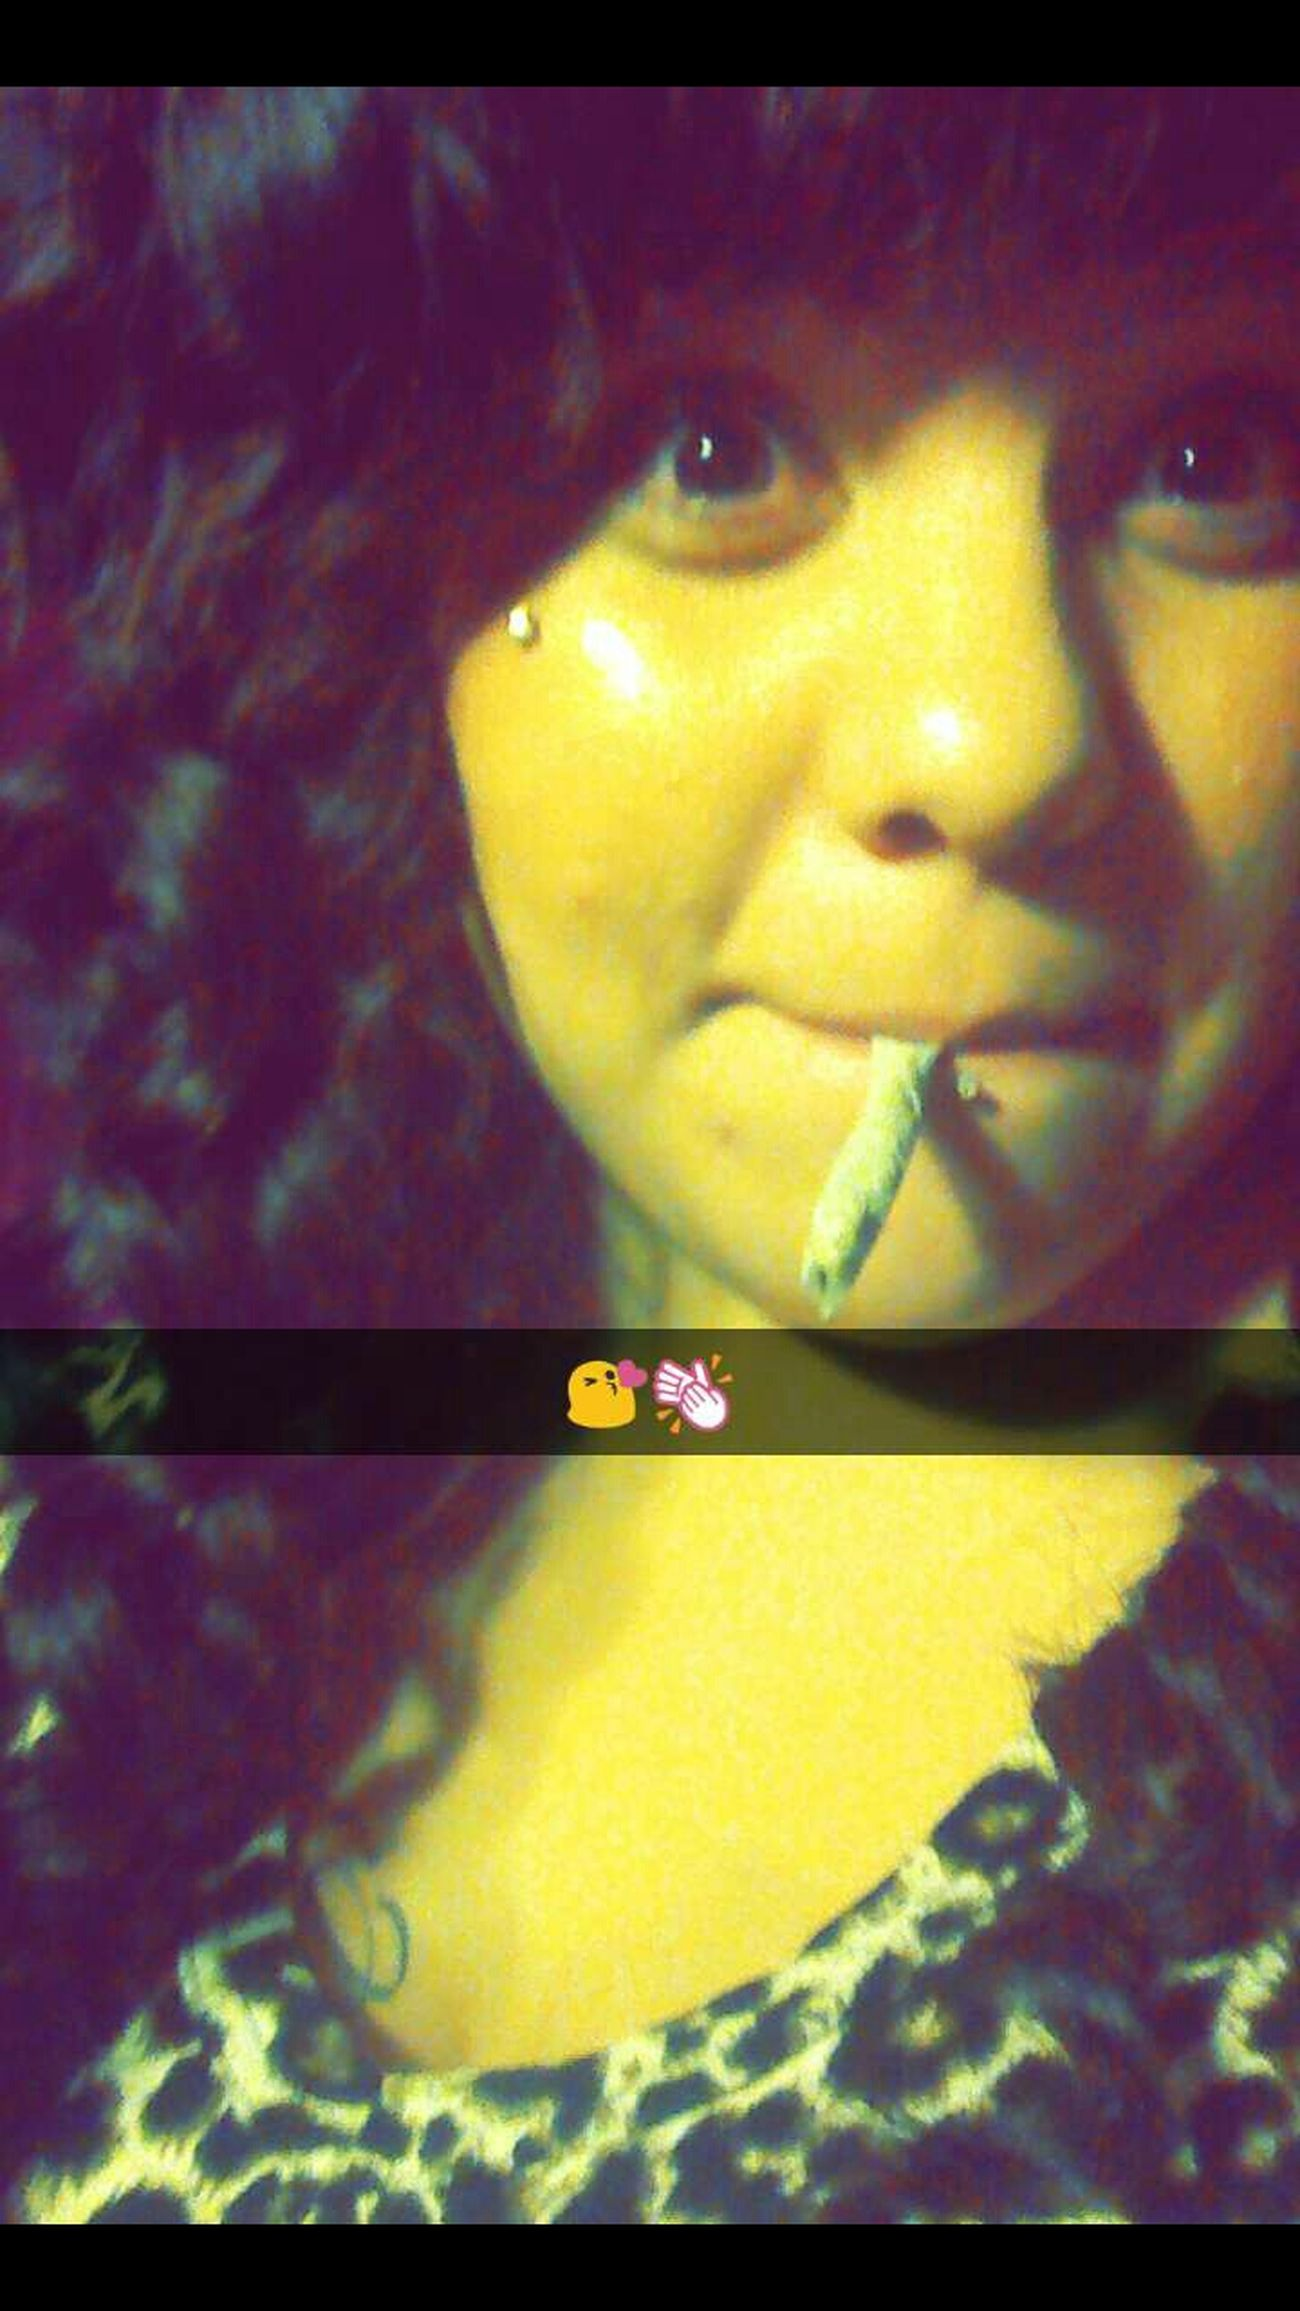 Big Eyes Marijuana Times Selfie Marijuana HighLife. MaryJane♥️ High Life Dreaming